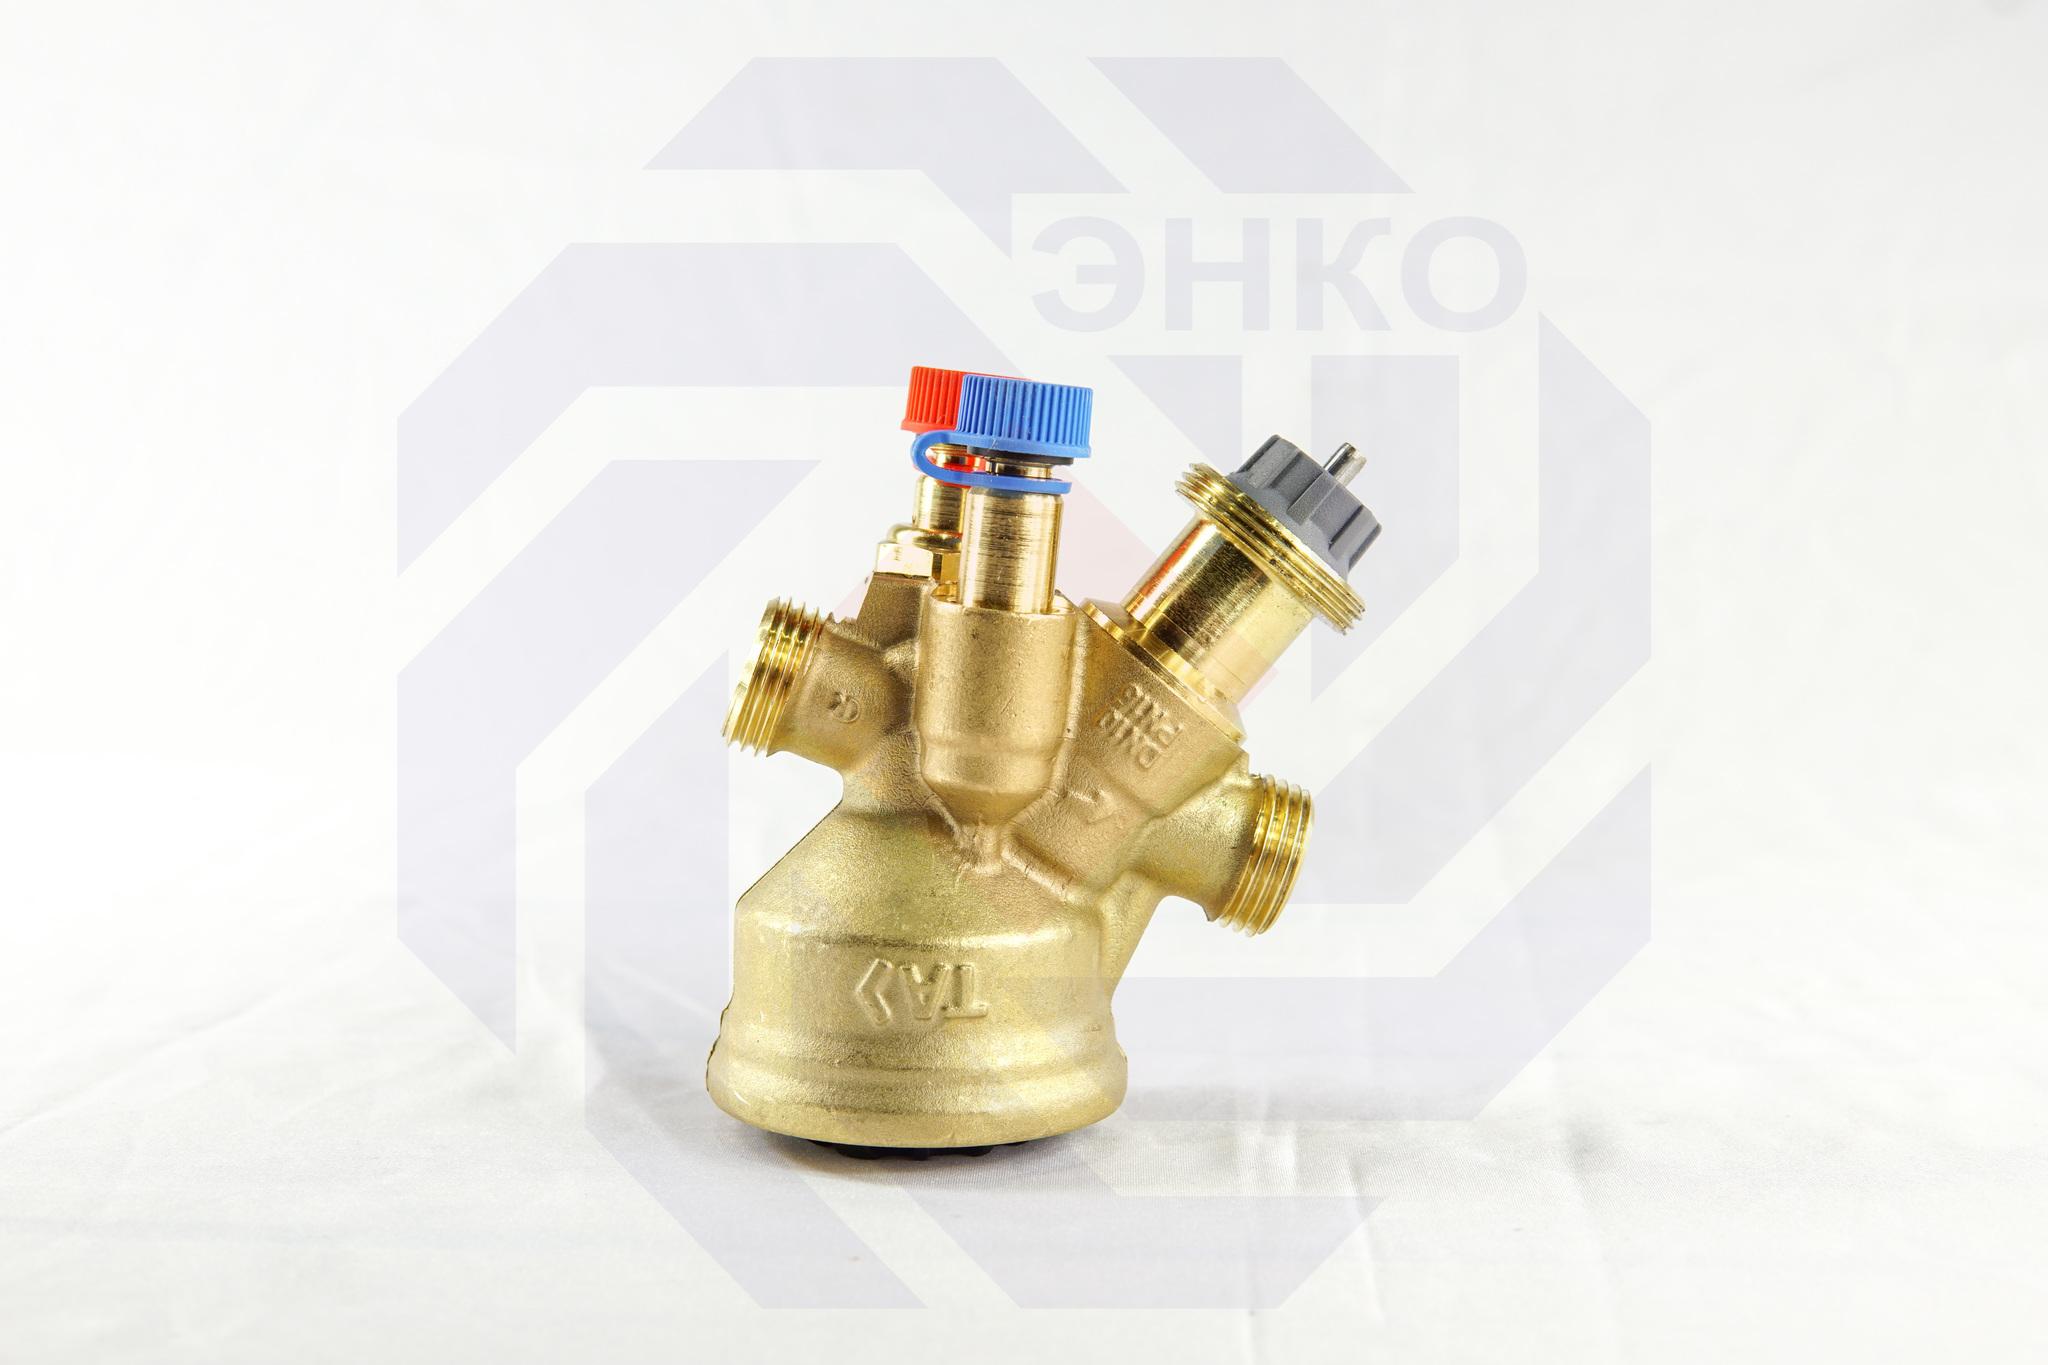 Клапан балансировочный и регулирующий IMI TA-COMPACT-P DN 10